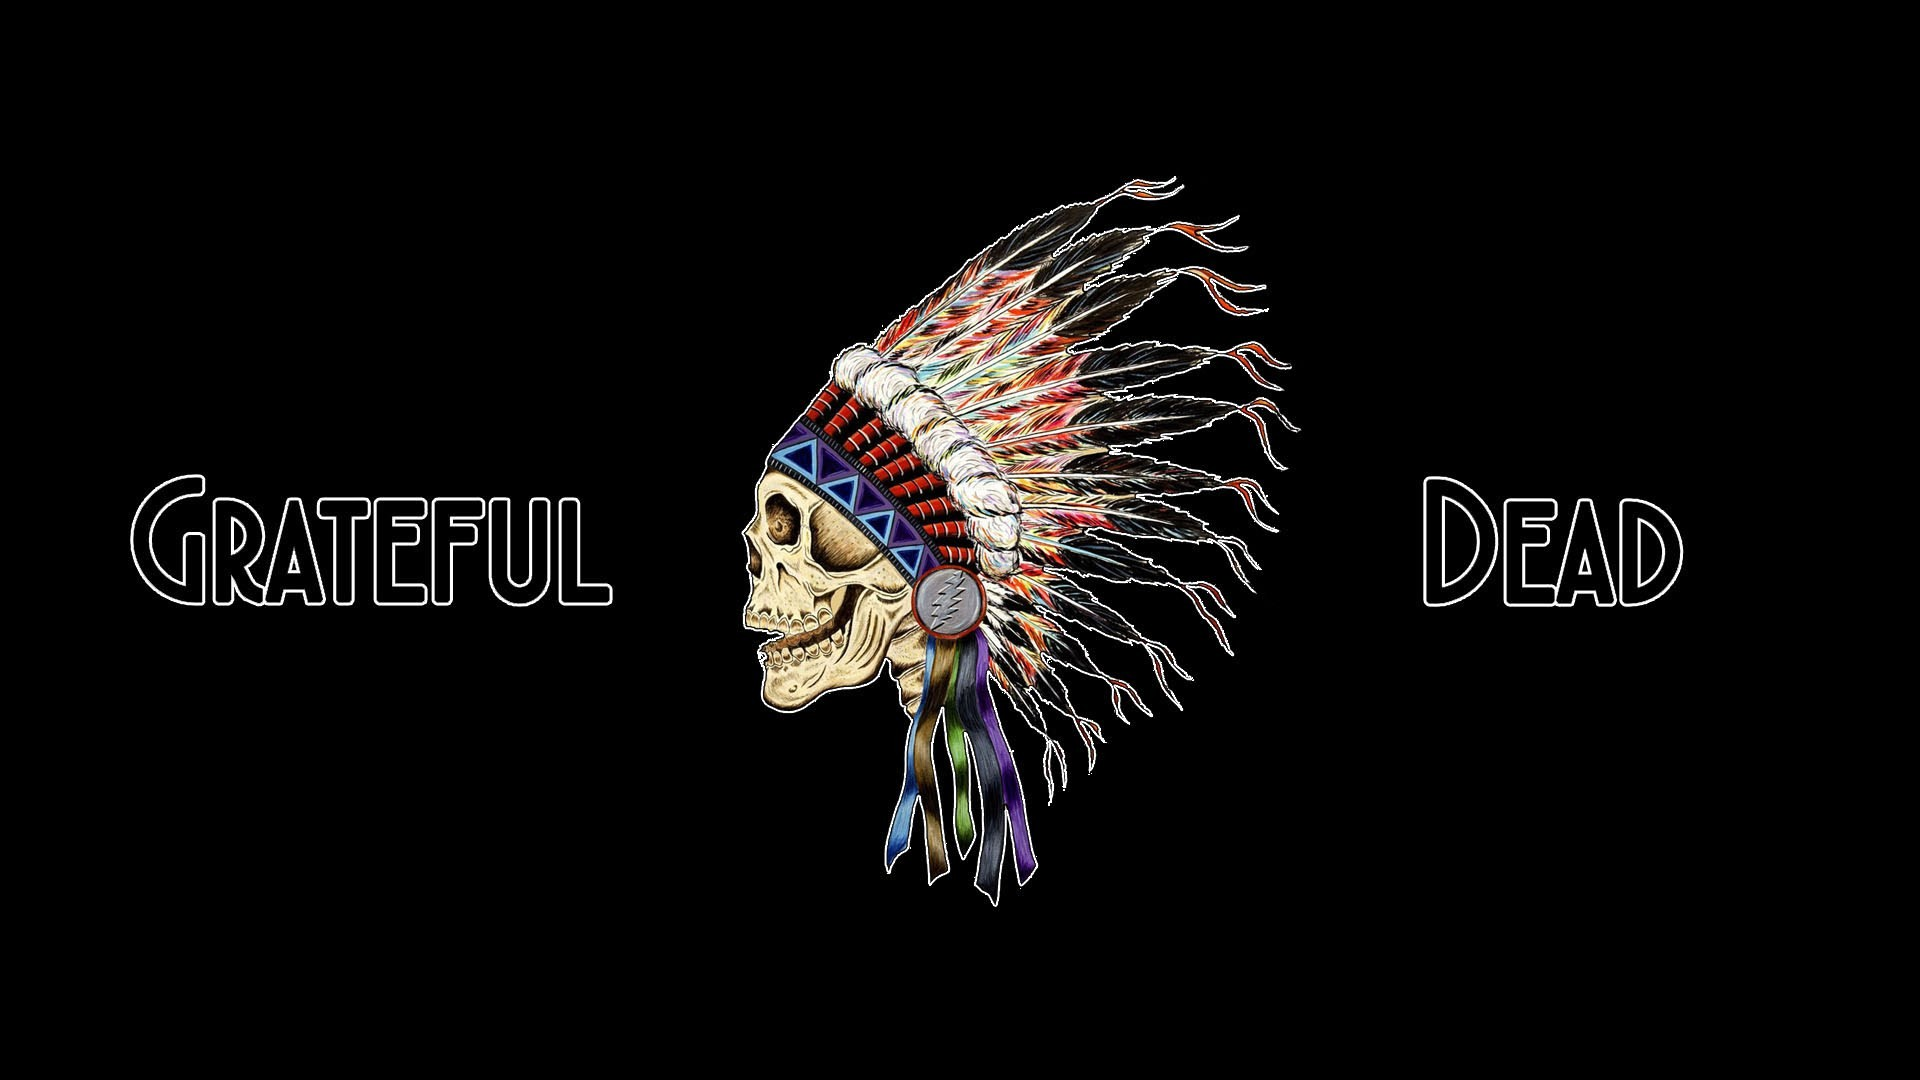 Grateful Dead Screensavers Wallpapers 50 Images